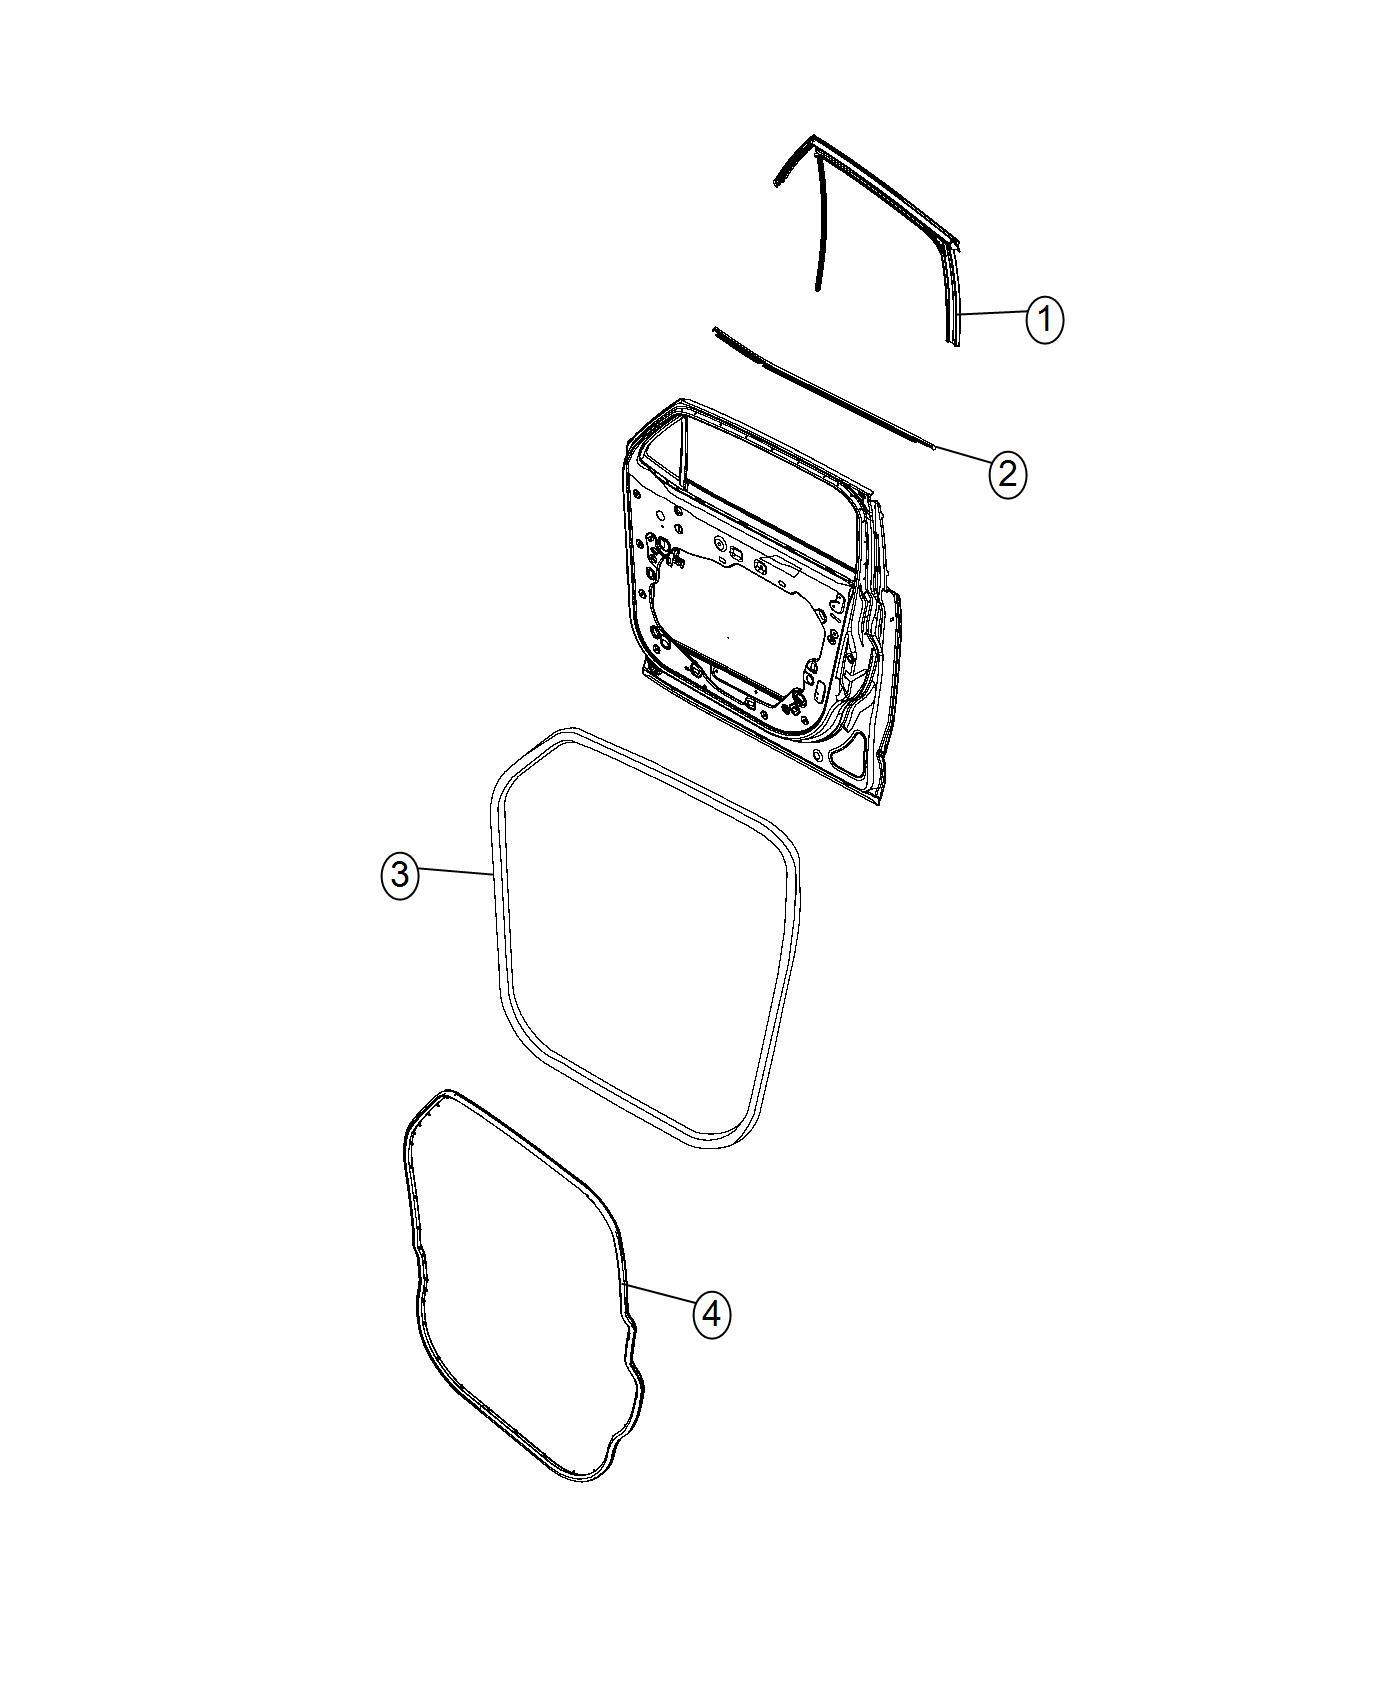 118367 tone trailer hitch wiring harness toyota tundra 2000 ebay